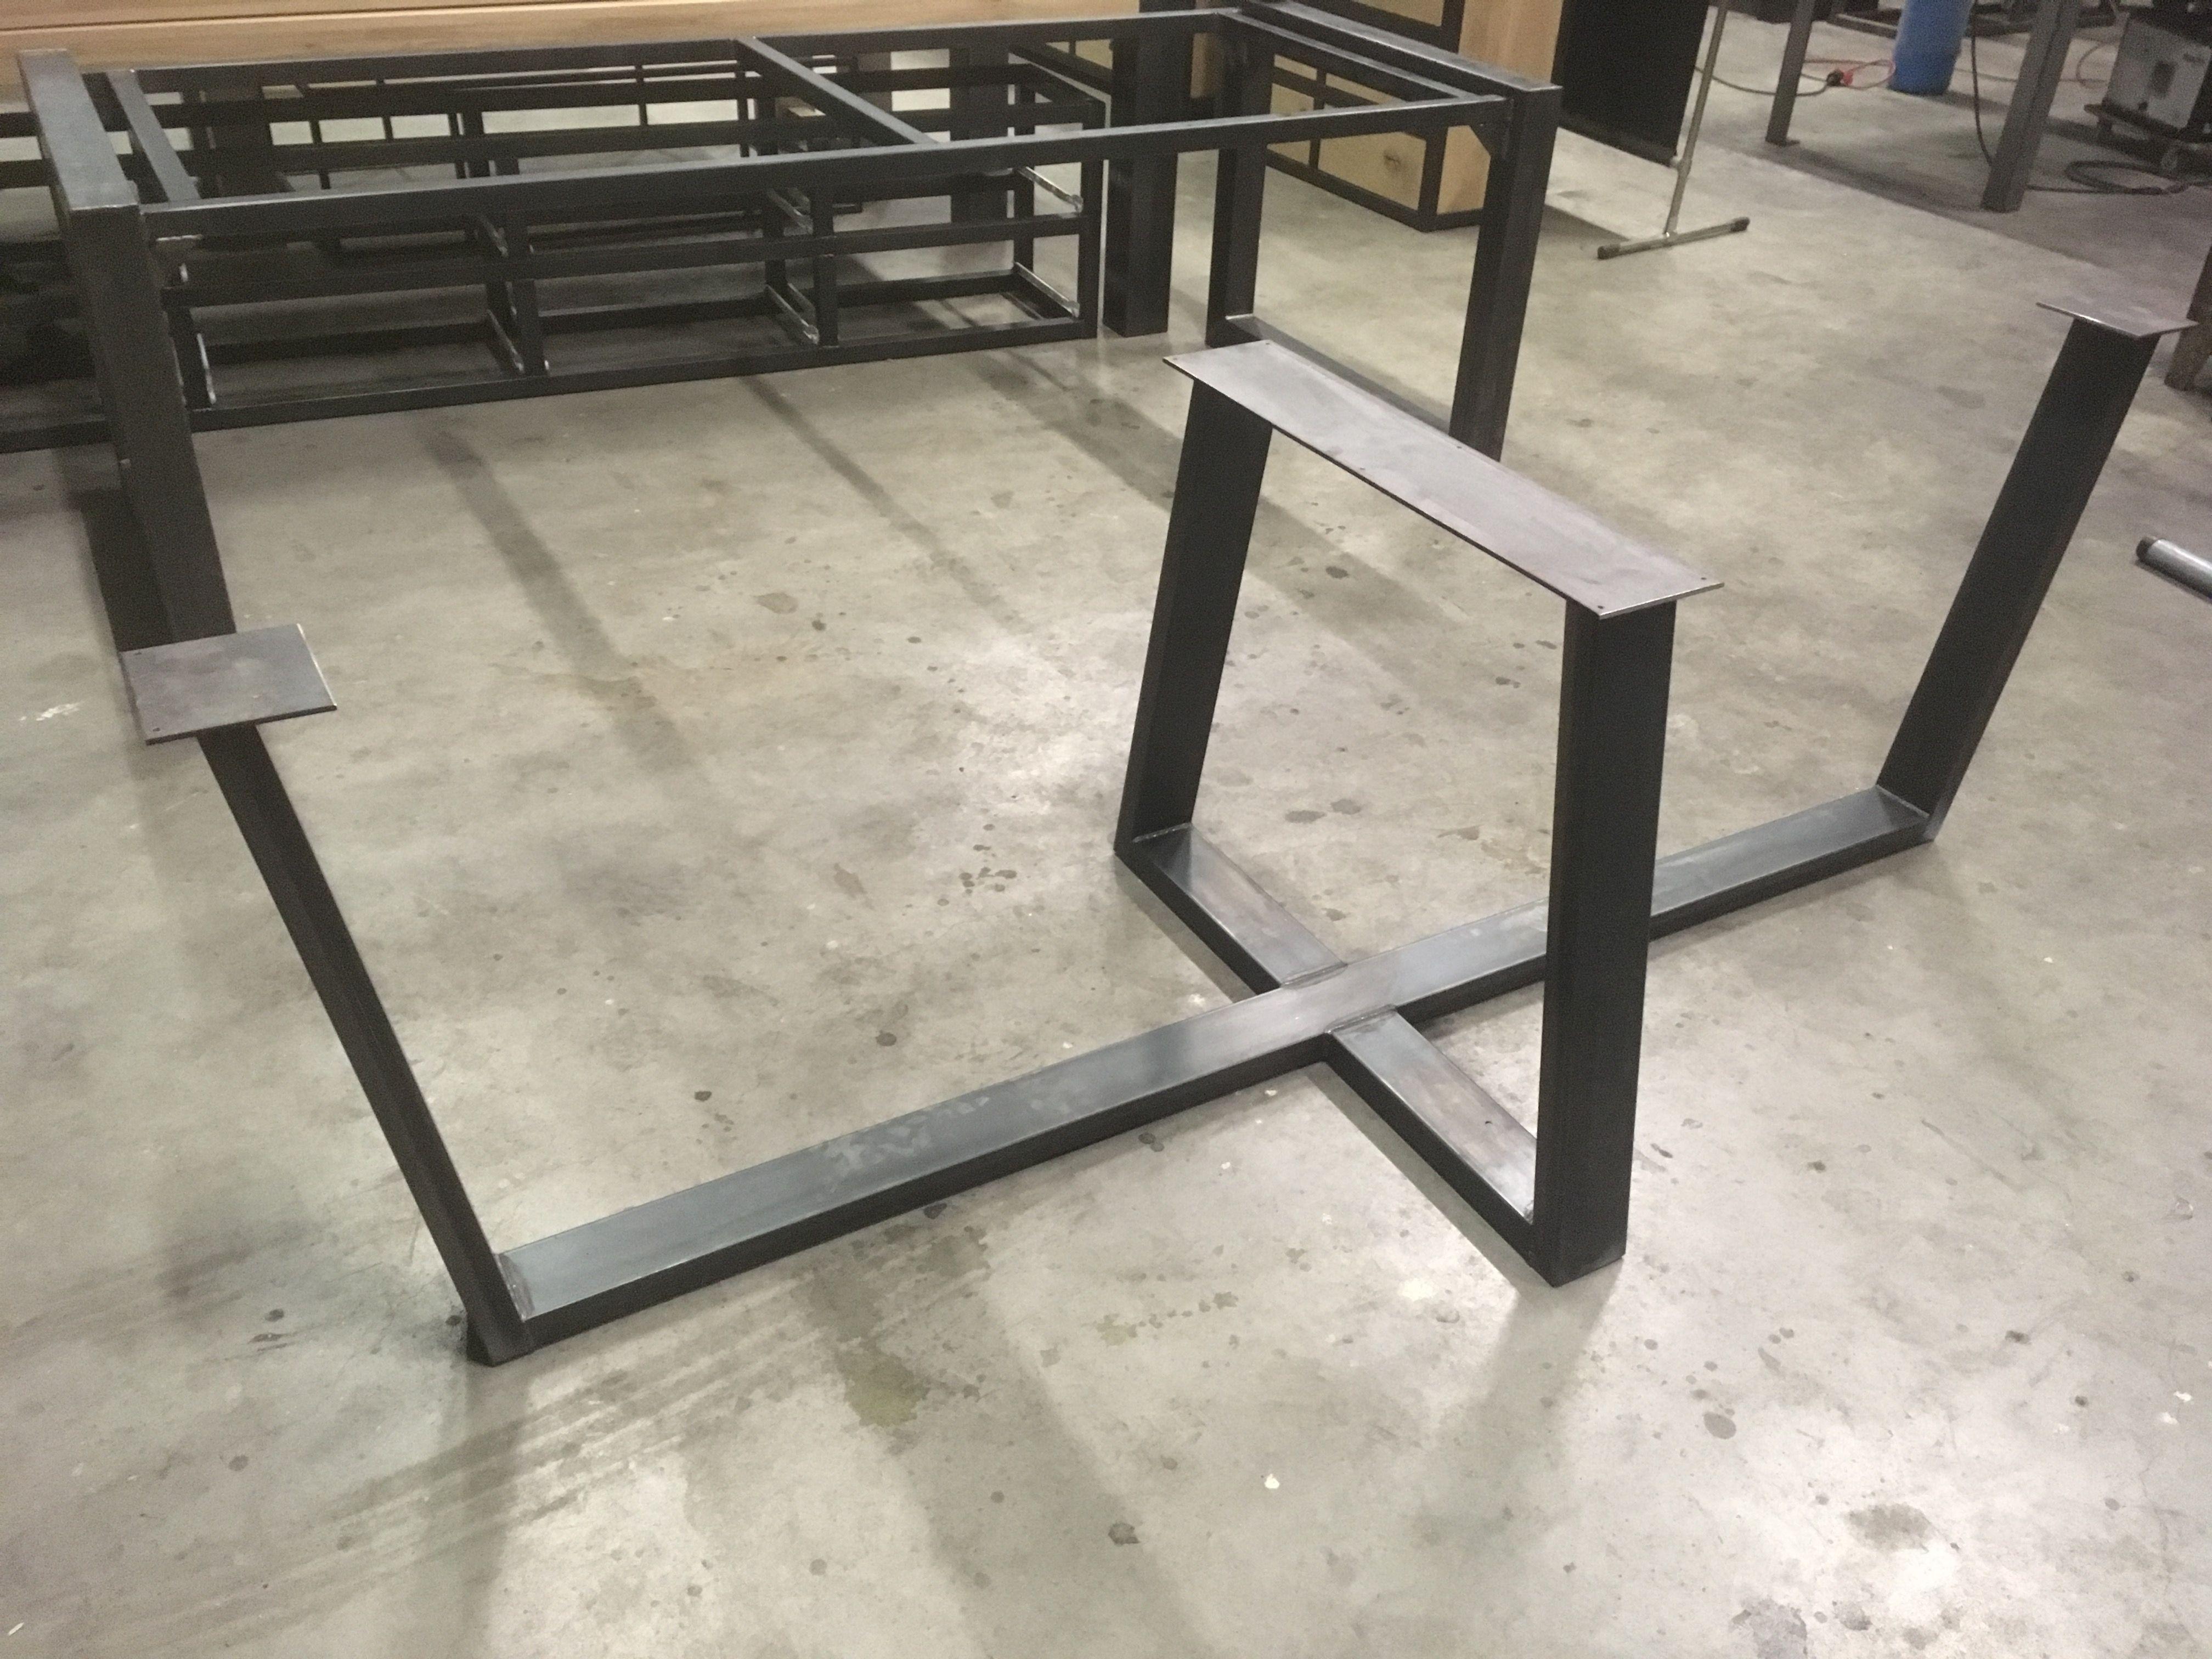 Top Stalen tafel onderstel | Stalen onderstellen / frames in 2019 OT85